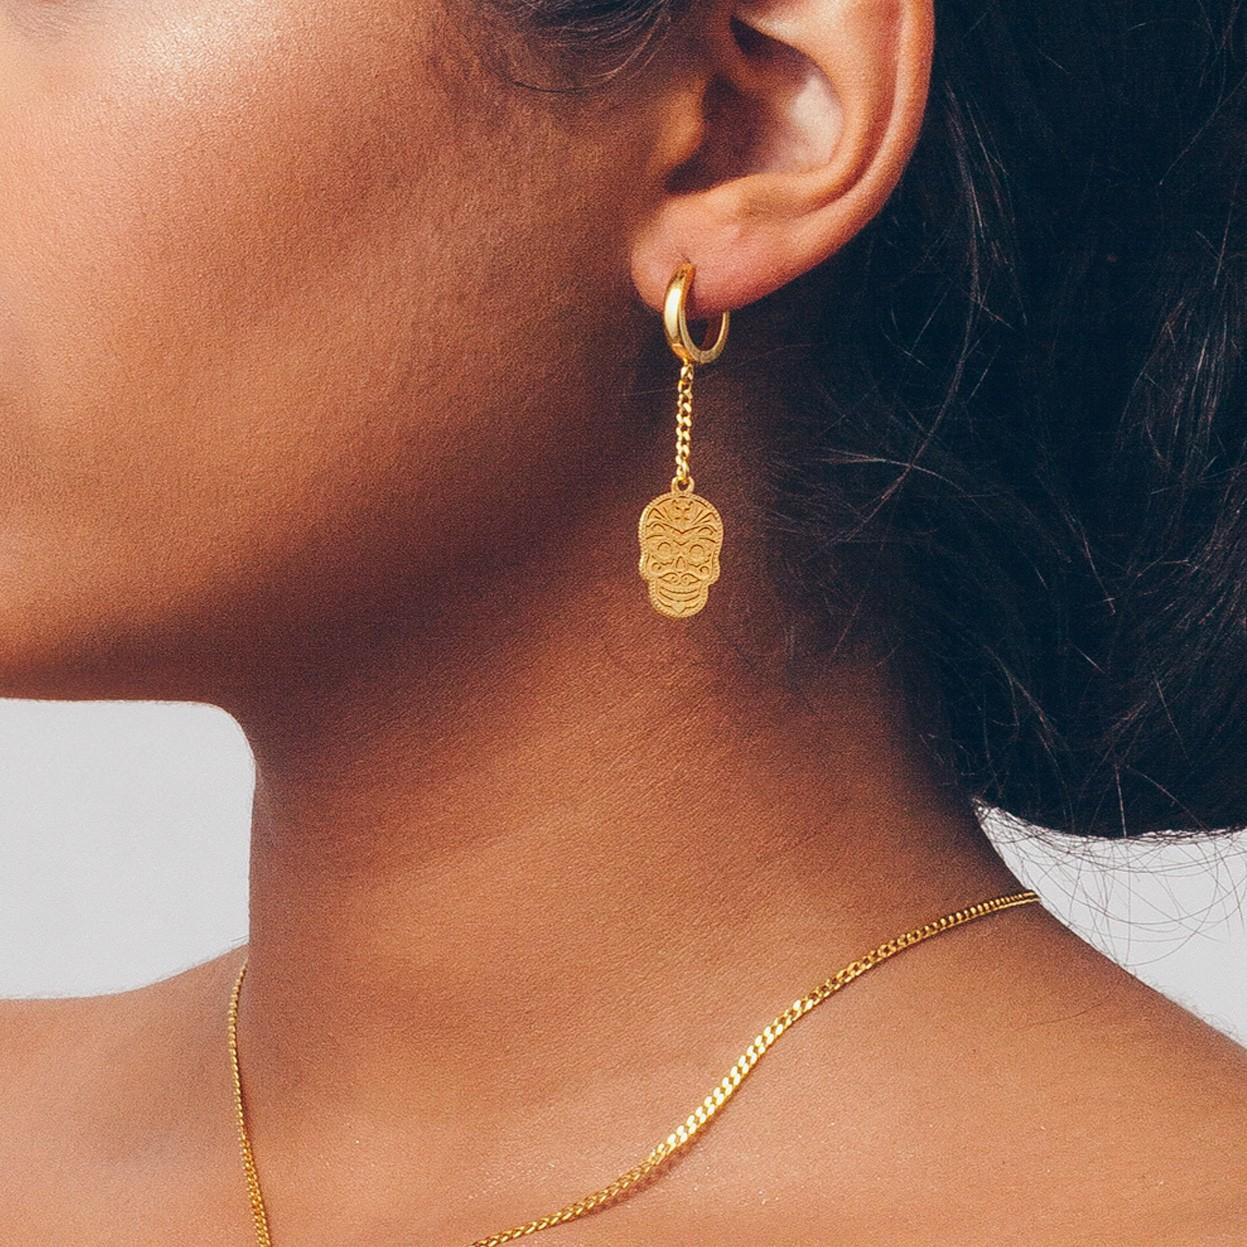 Silver SUGAR SKULL earrings 925